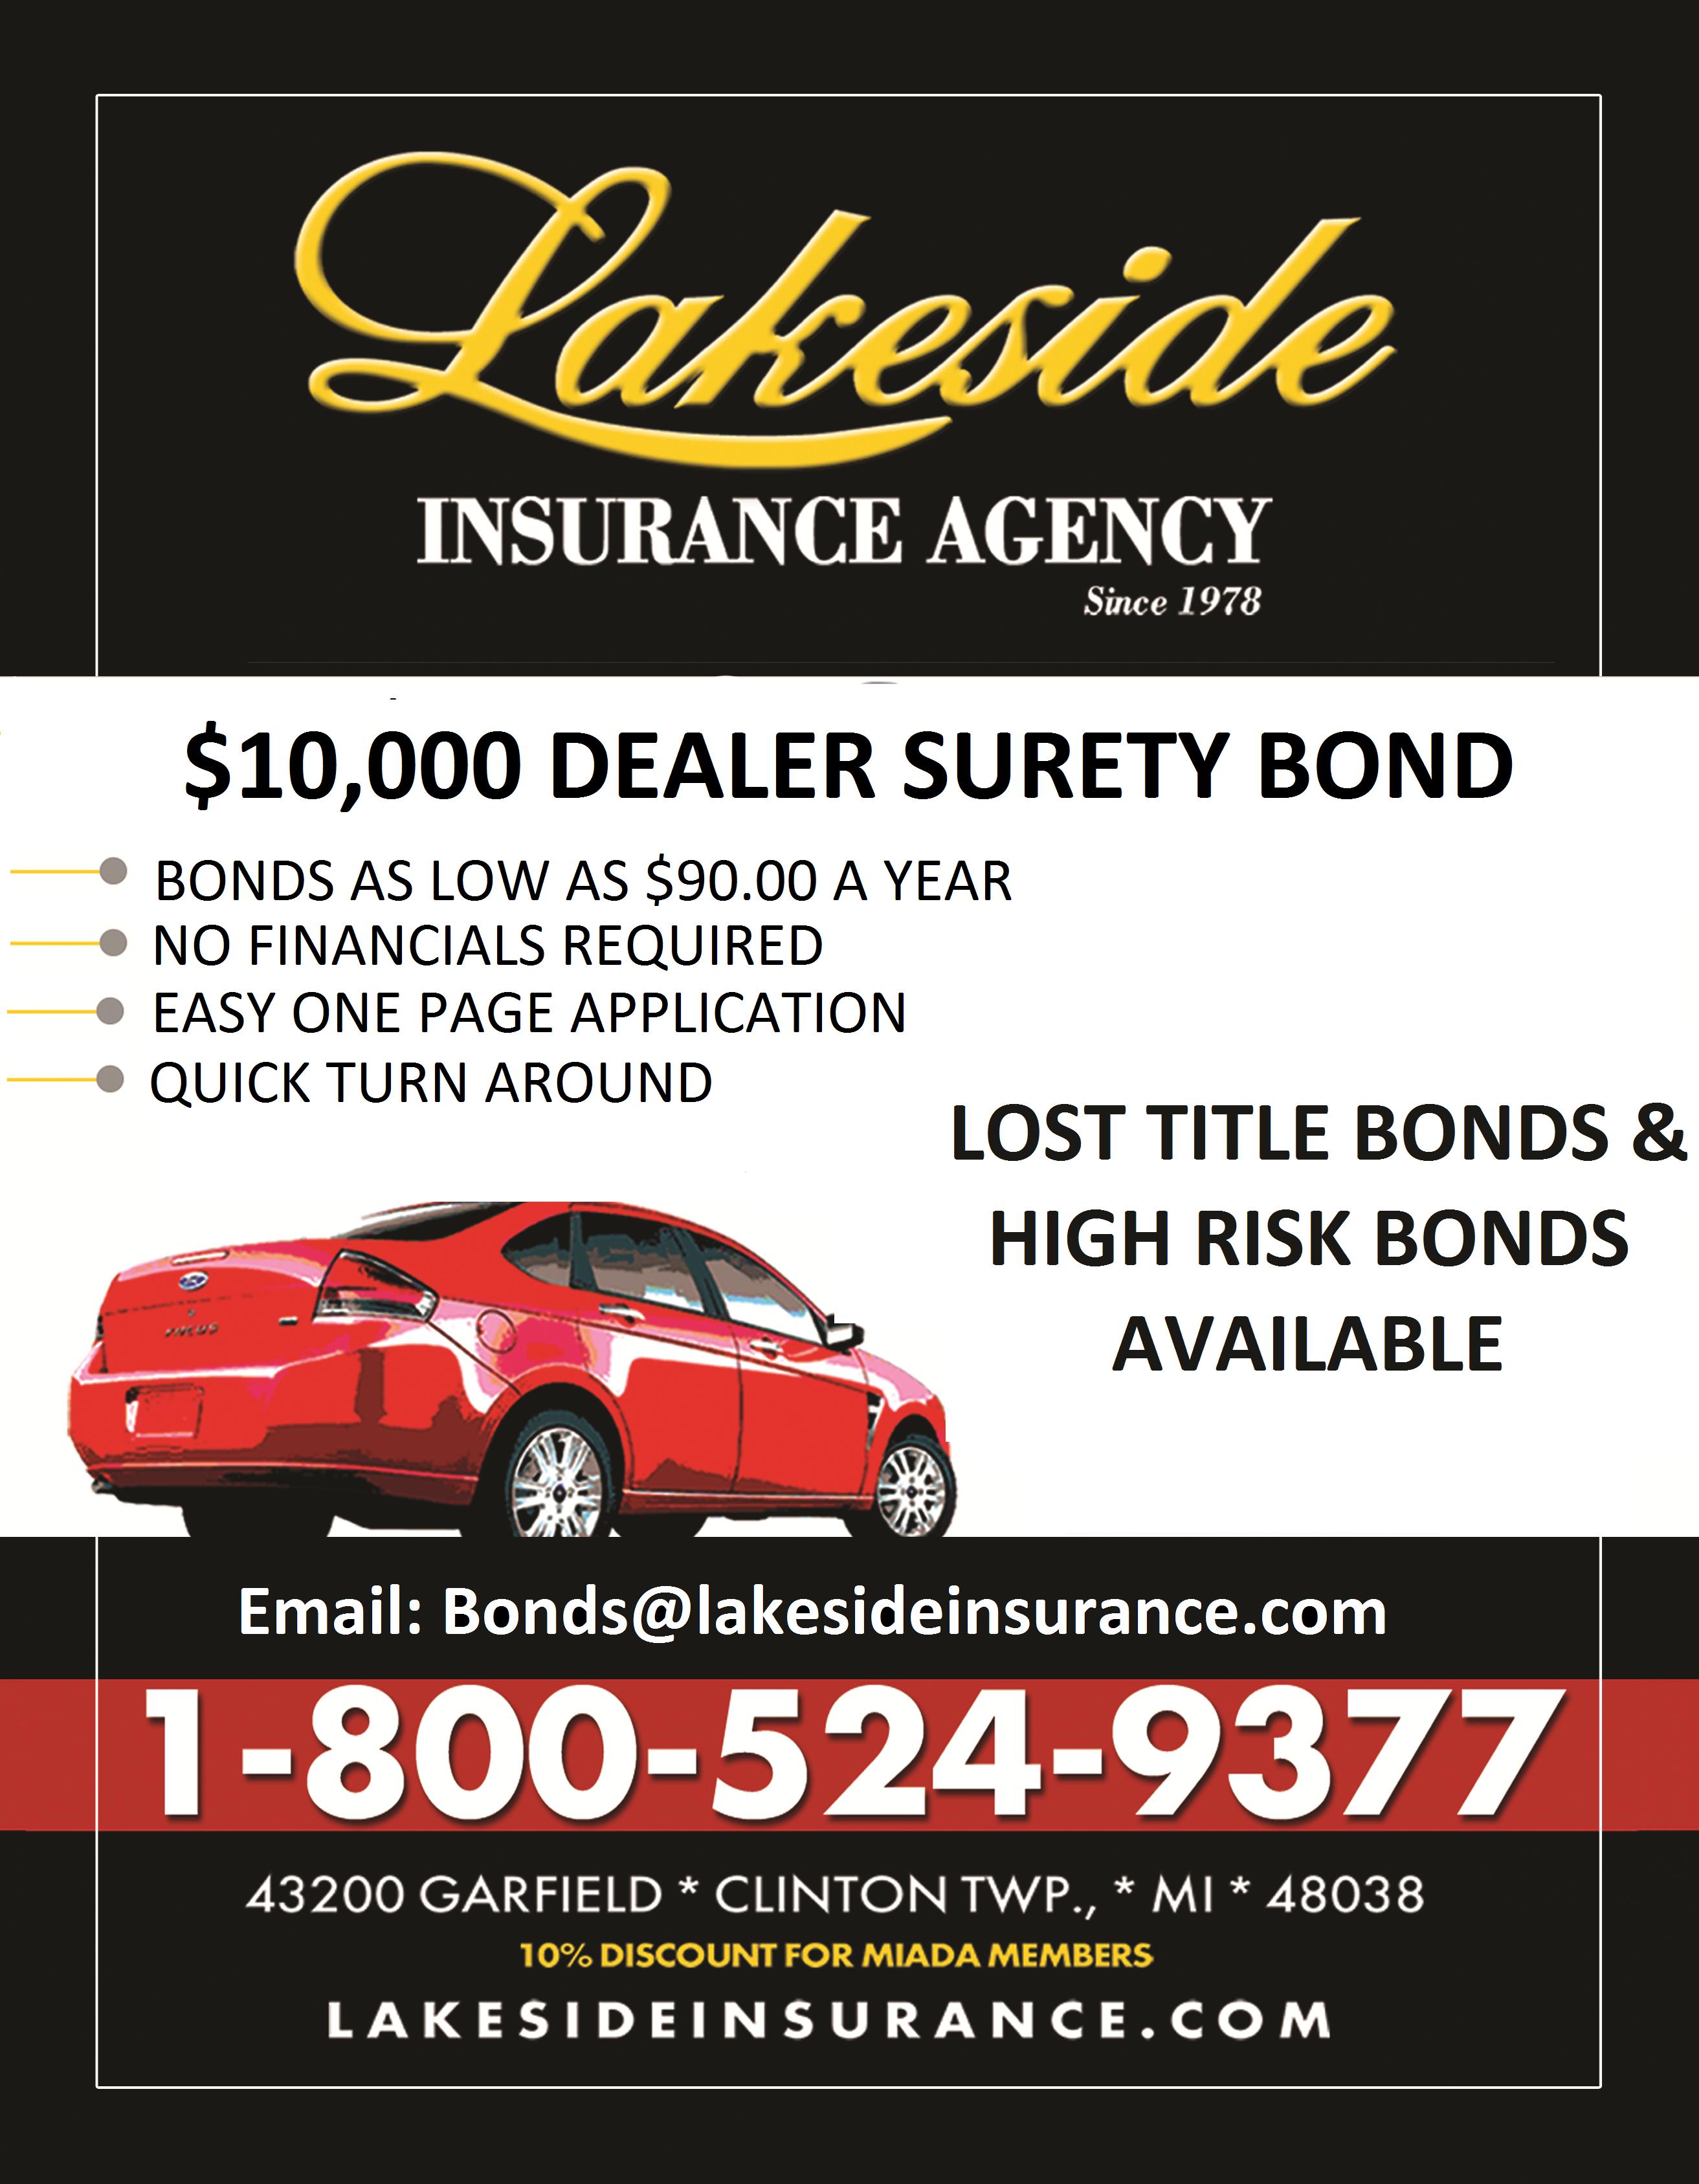 lakeside insurance dealer surety bonds metro detroit macomb oakland wayne county michigan